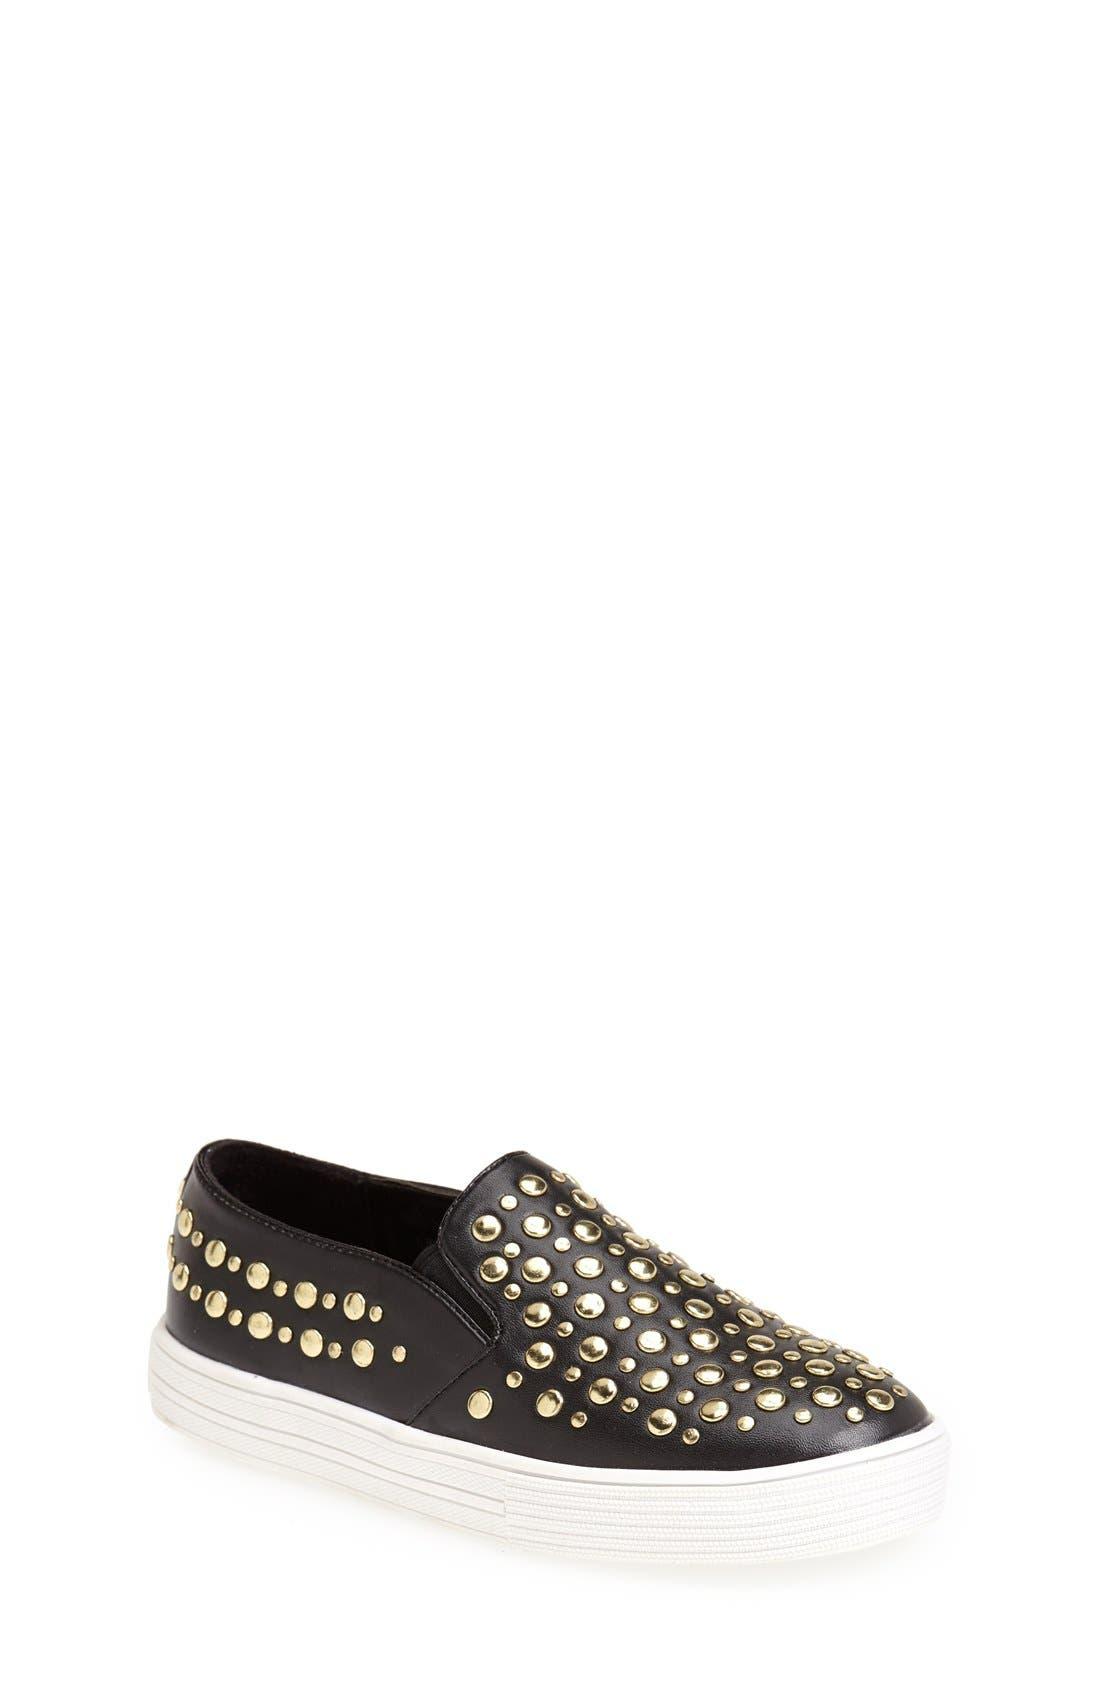 'Ivy Jade' Slip-On Sneaker,                             Main thumbnail 1, color,                             001